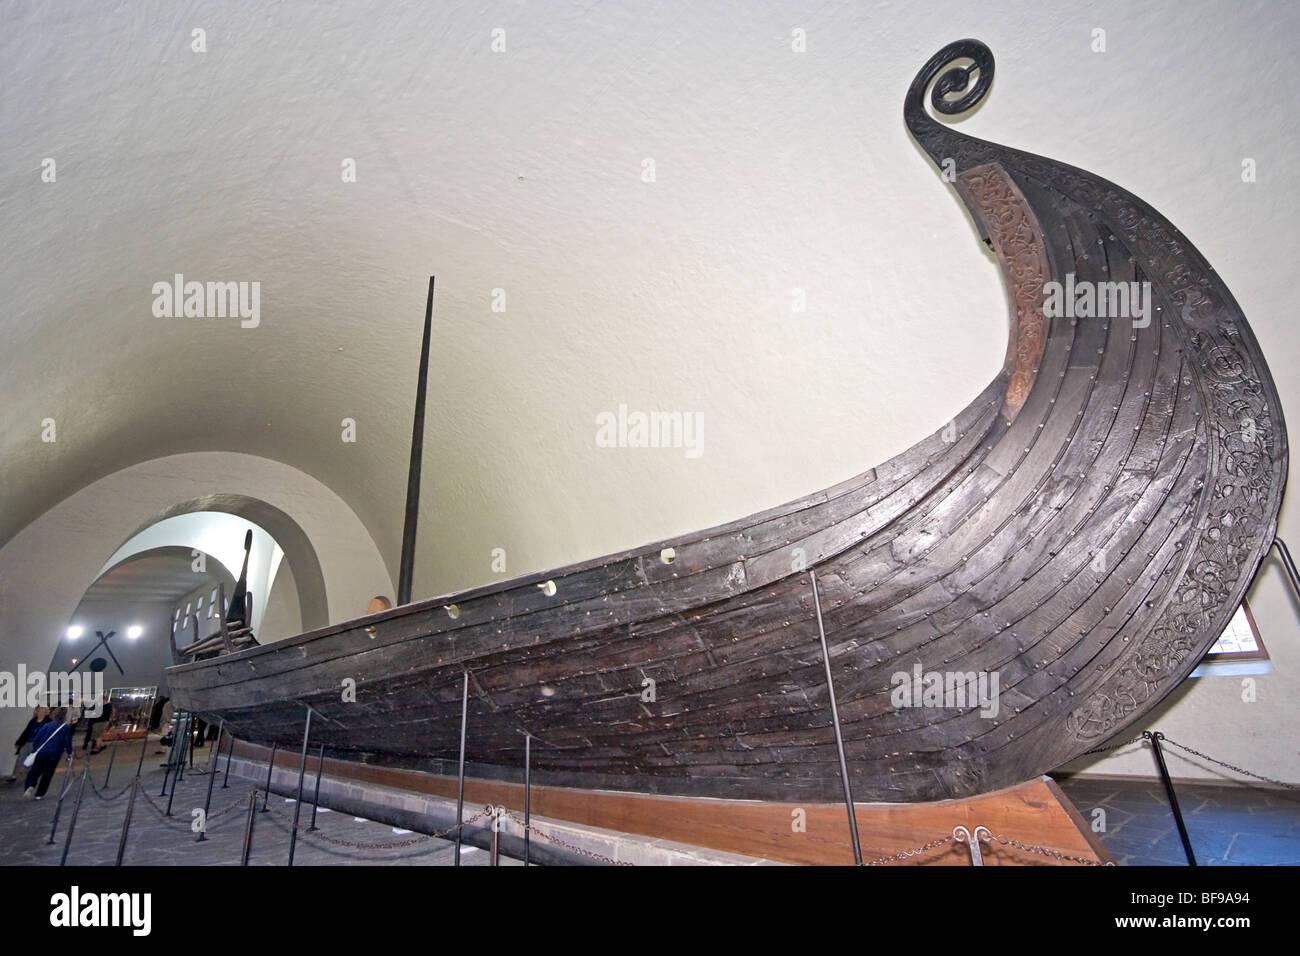 Oseburg Viking ship in Viking Ship Museum in Oslo, Norway. - Stock Image